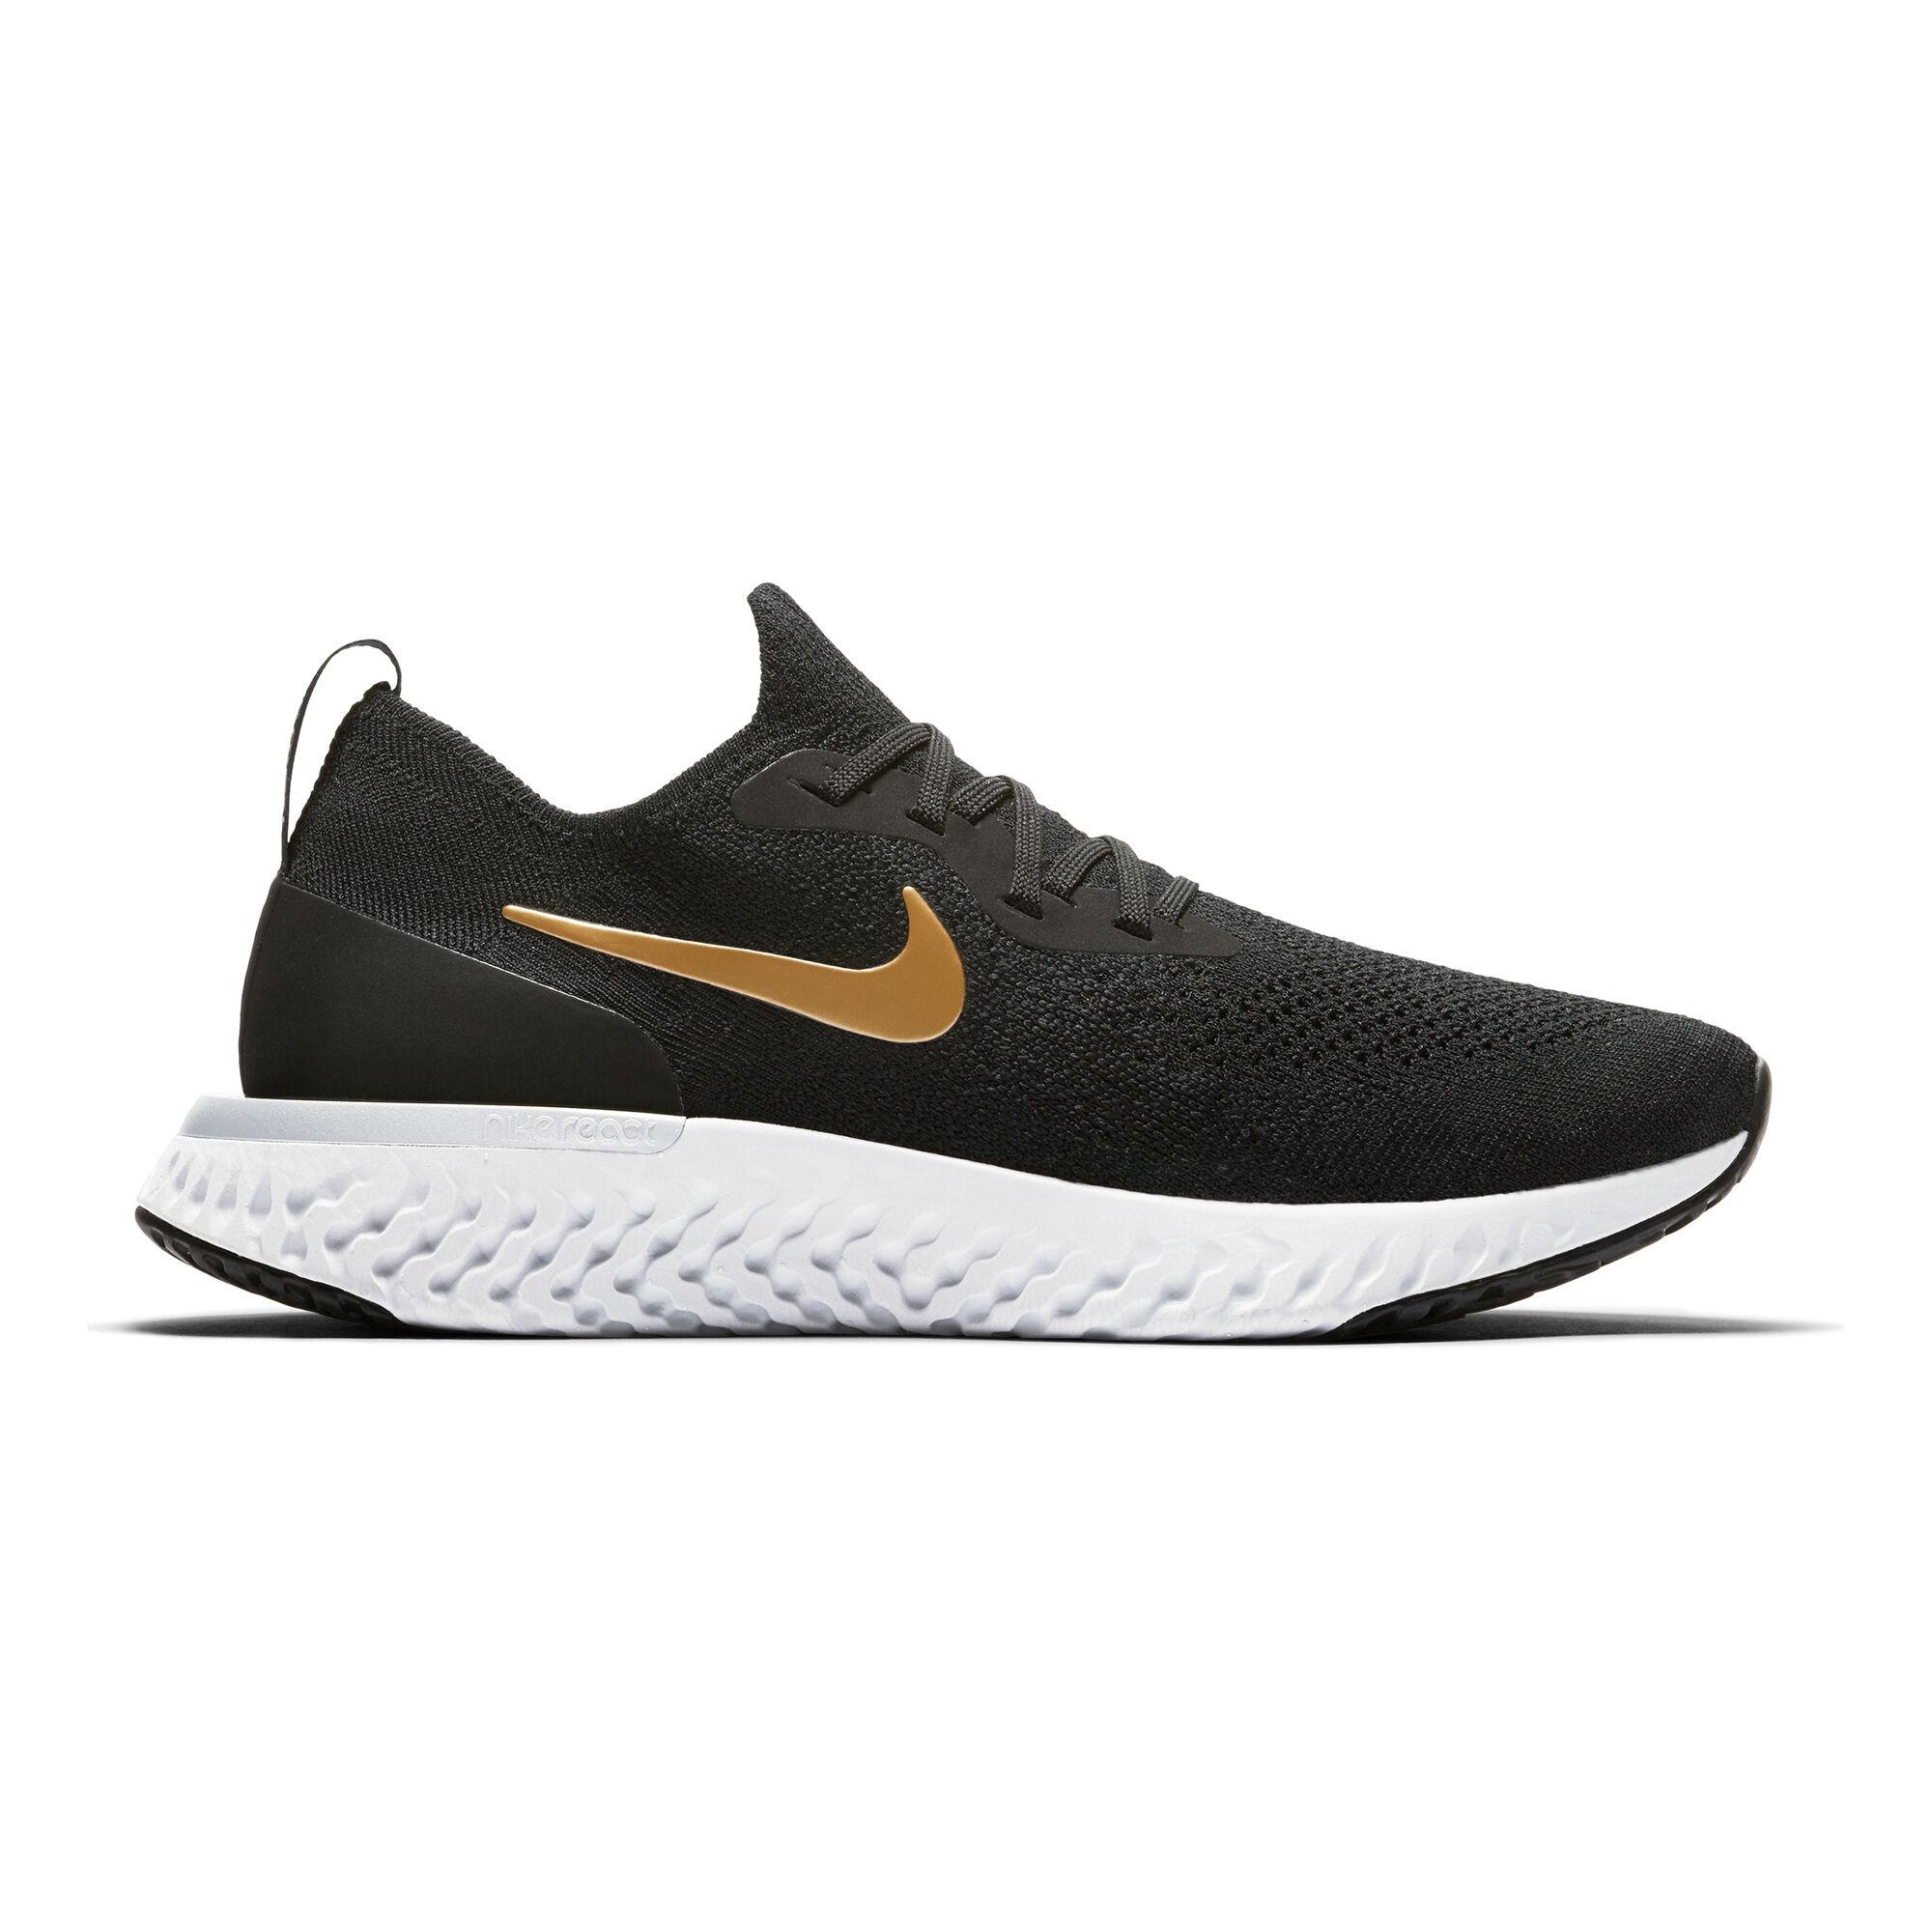 1f2c32637b07 buy Nike Epic React Flyknit Neutral Running Shoe Women - Black